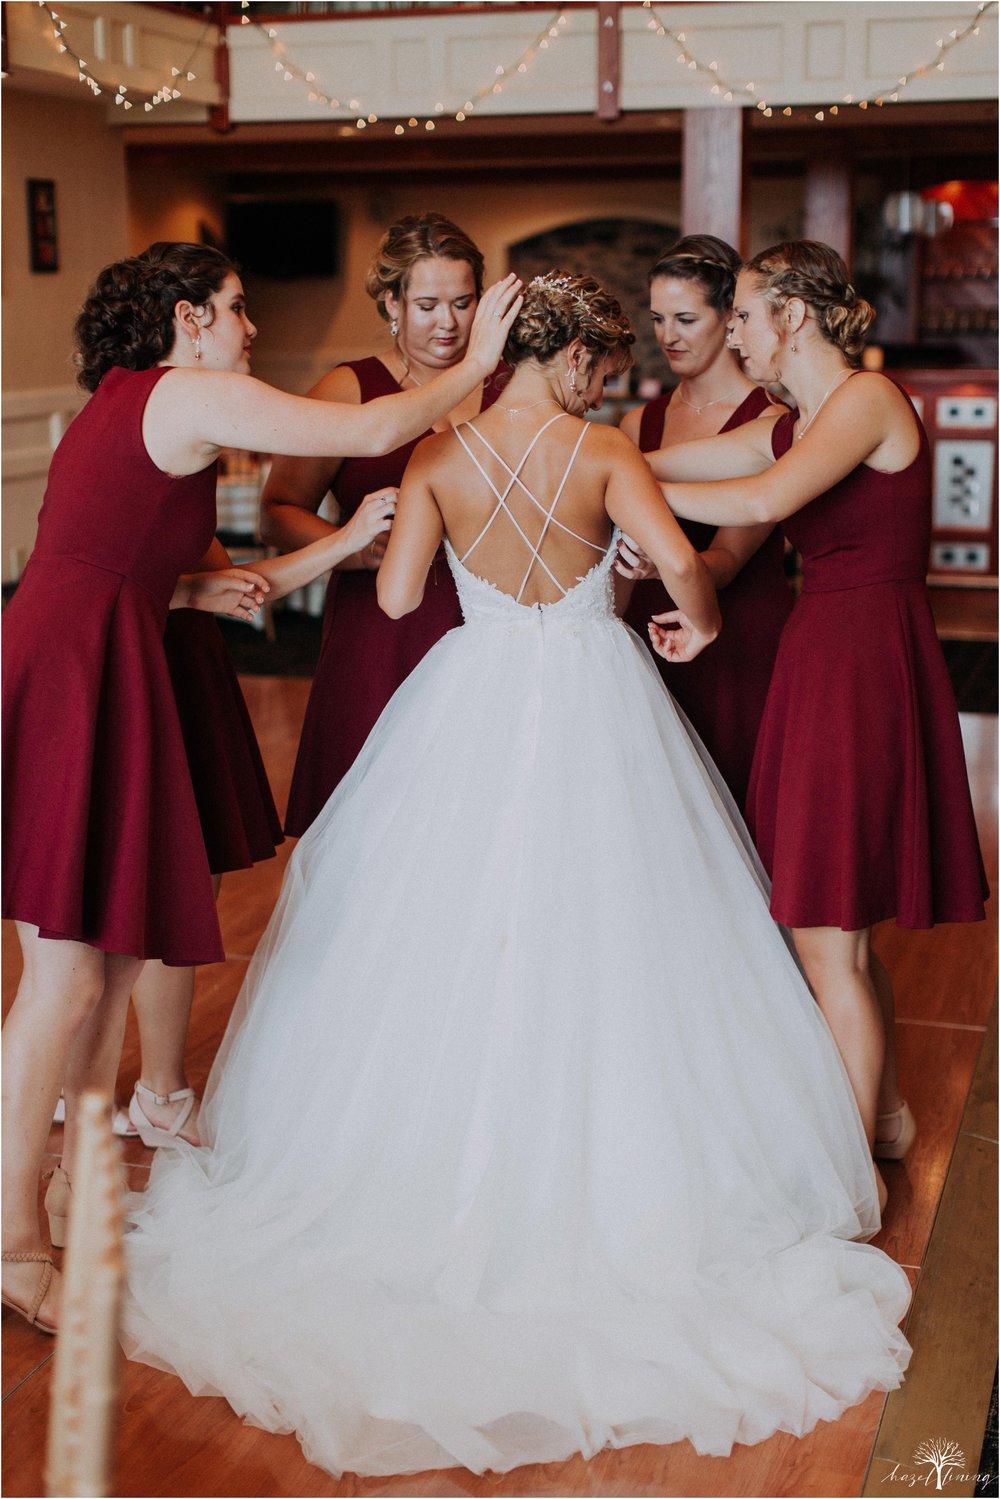 jonathan-weibel-becky-haywood-loft-at-sweetwater-cc-pennsburg-pennsylvania-rainy-day-summer-wedding-hazel-lining-travel-wedding-elopement-photography_0020.jpg